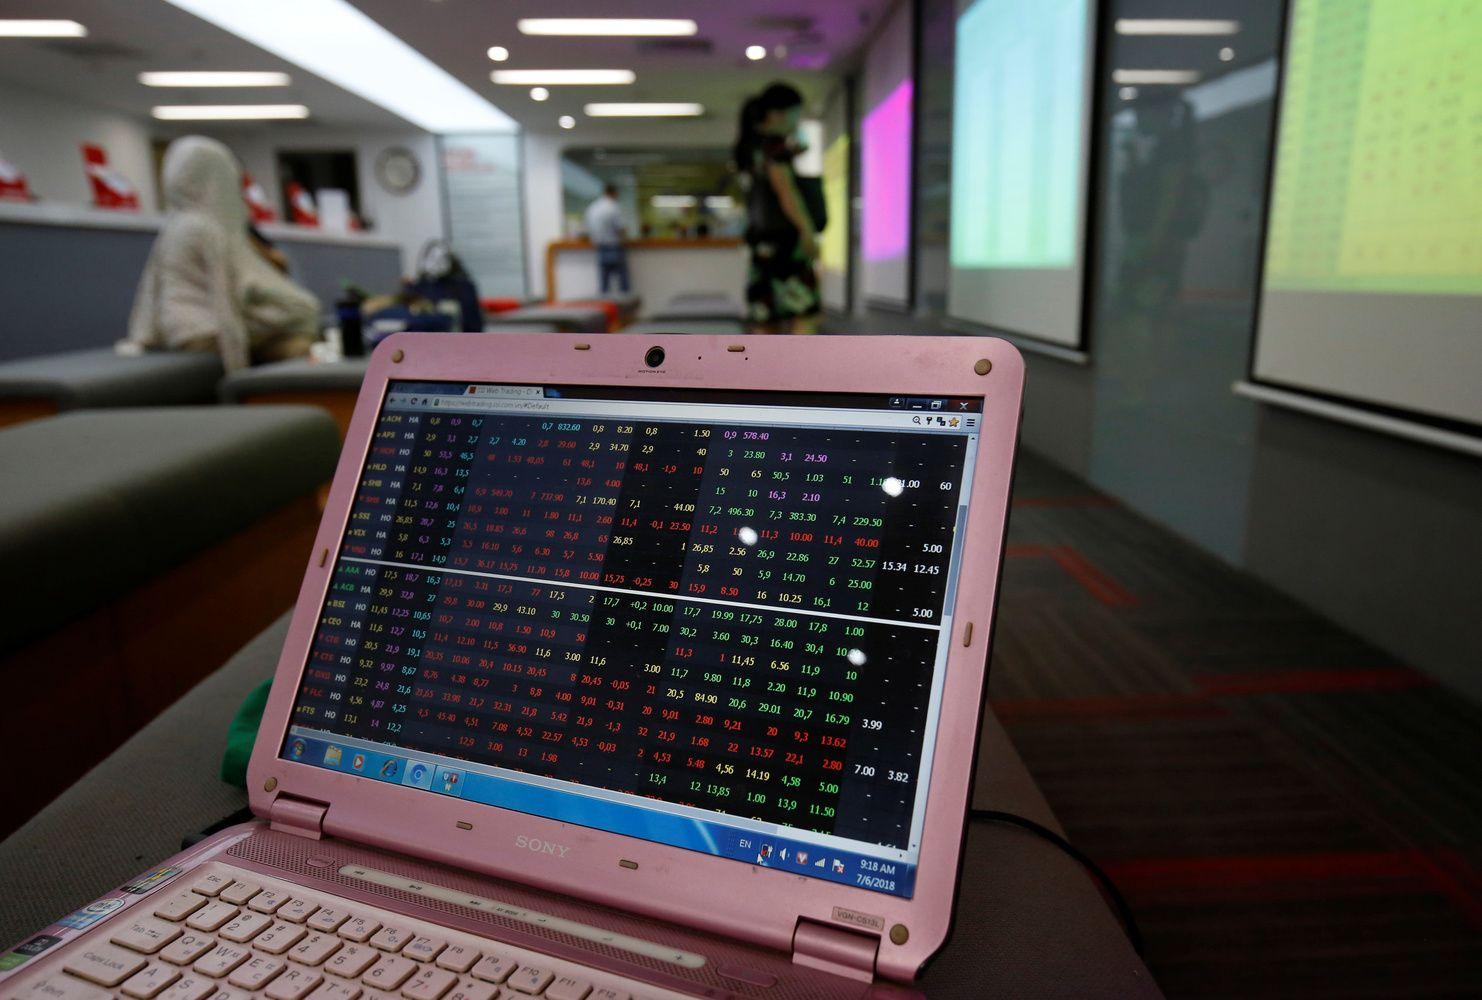 Stocks Recover After Trade List Angst; Yen Falls: Markets Wrap